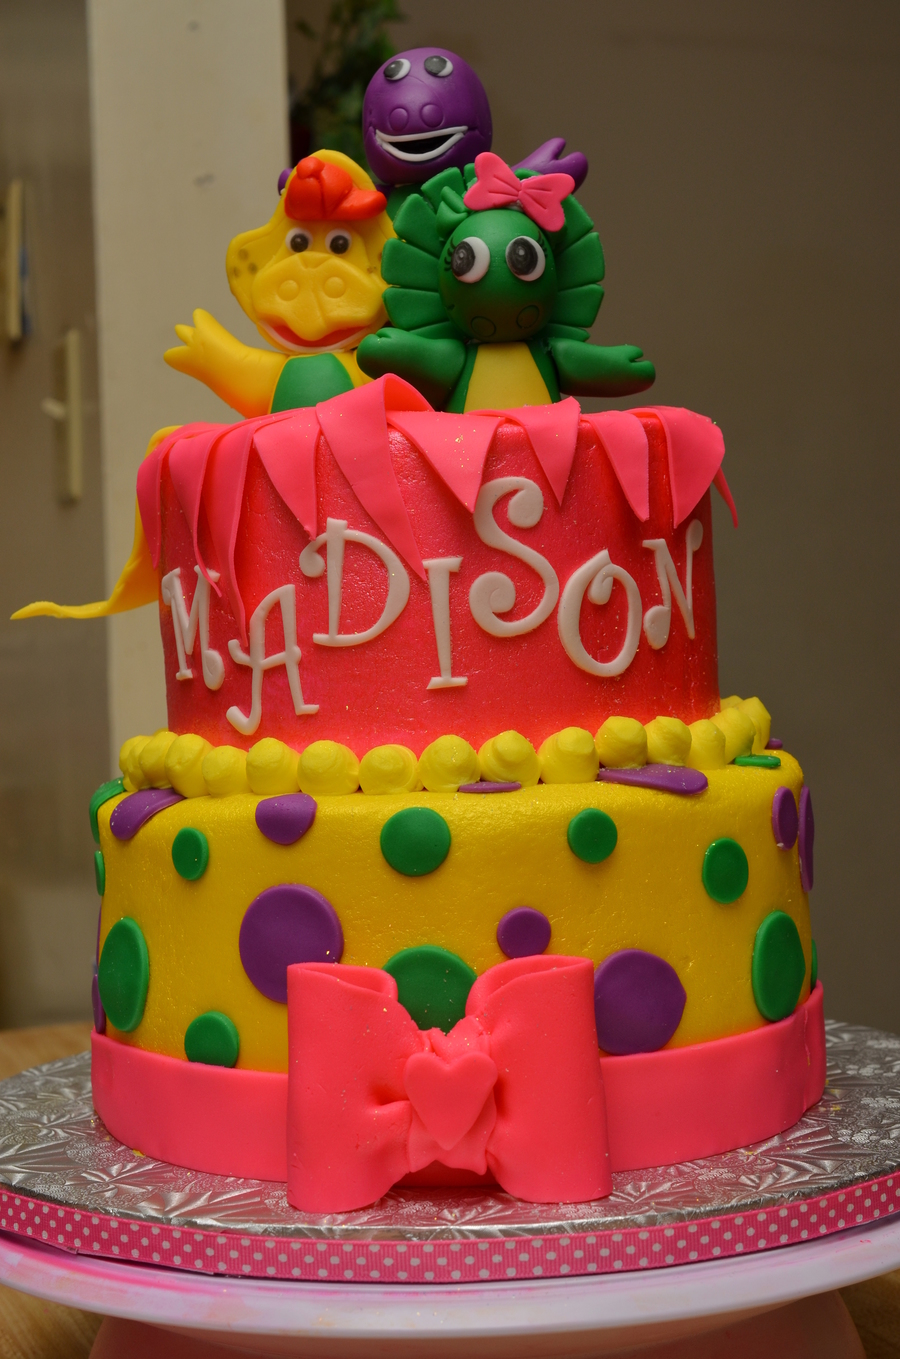 barney cake - photo #32